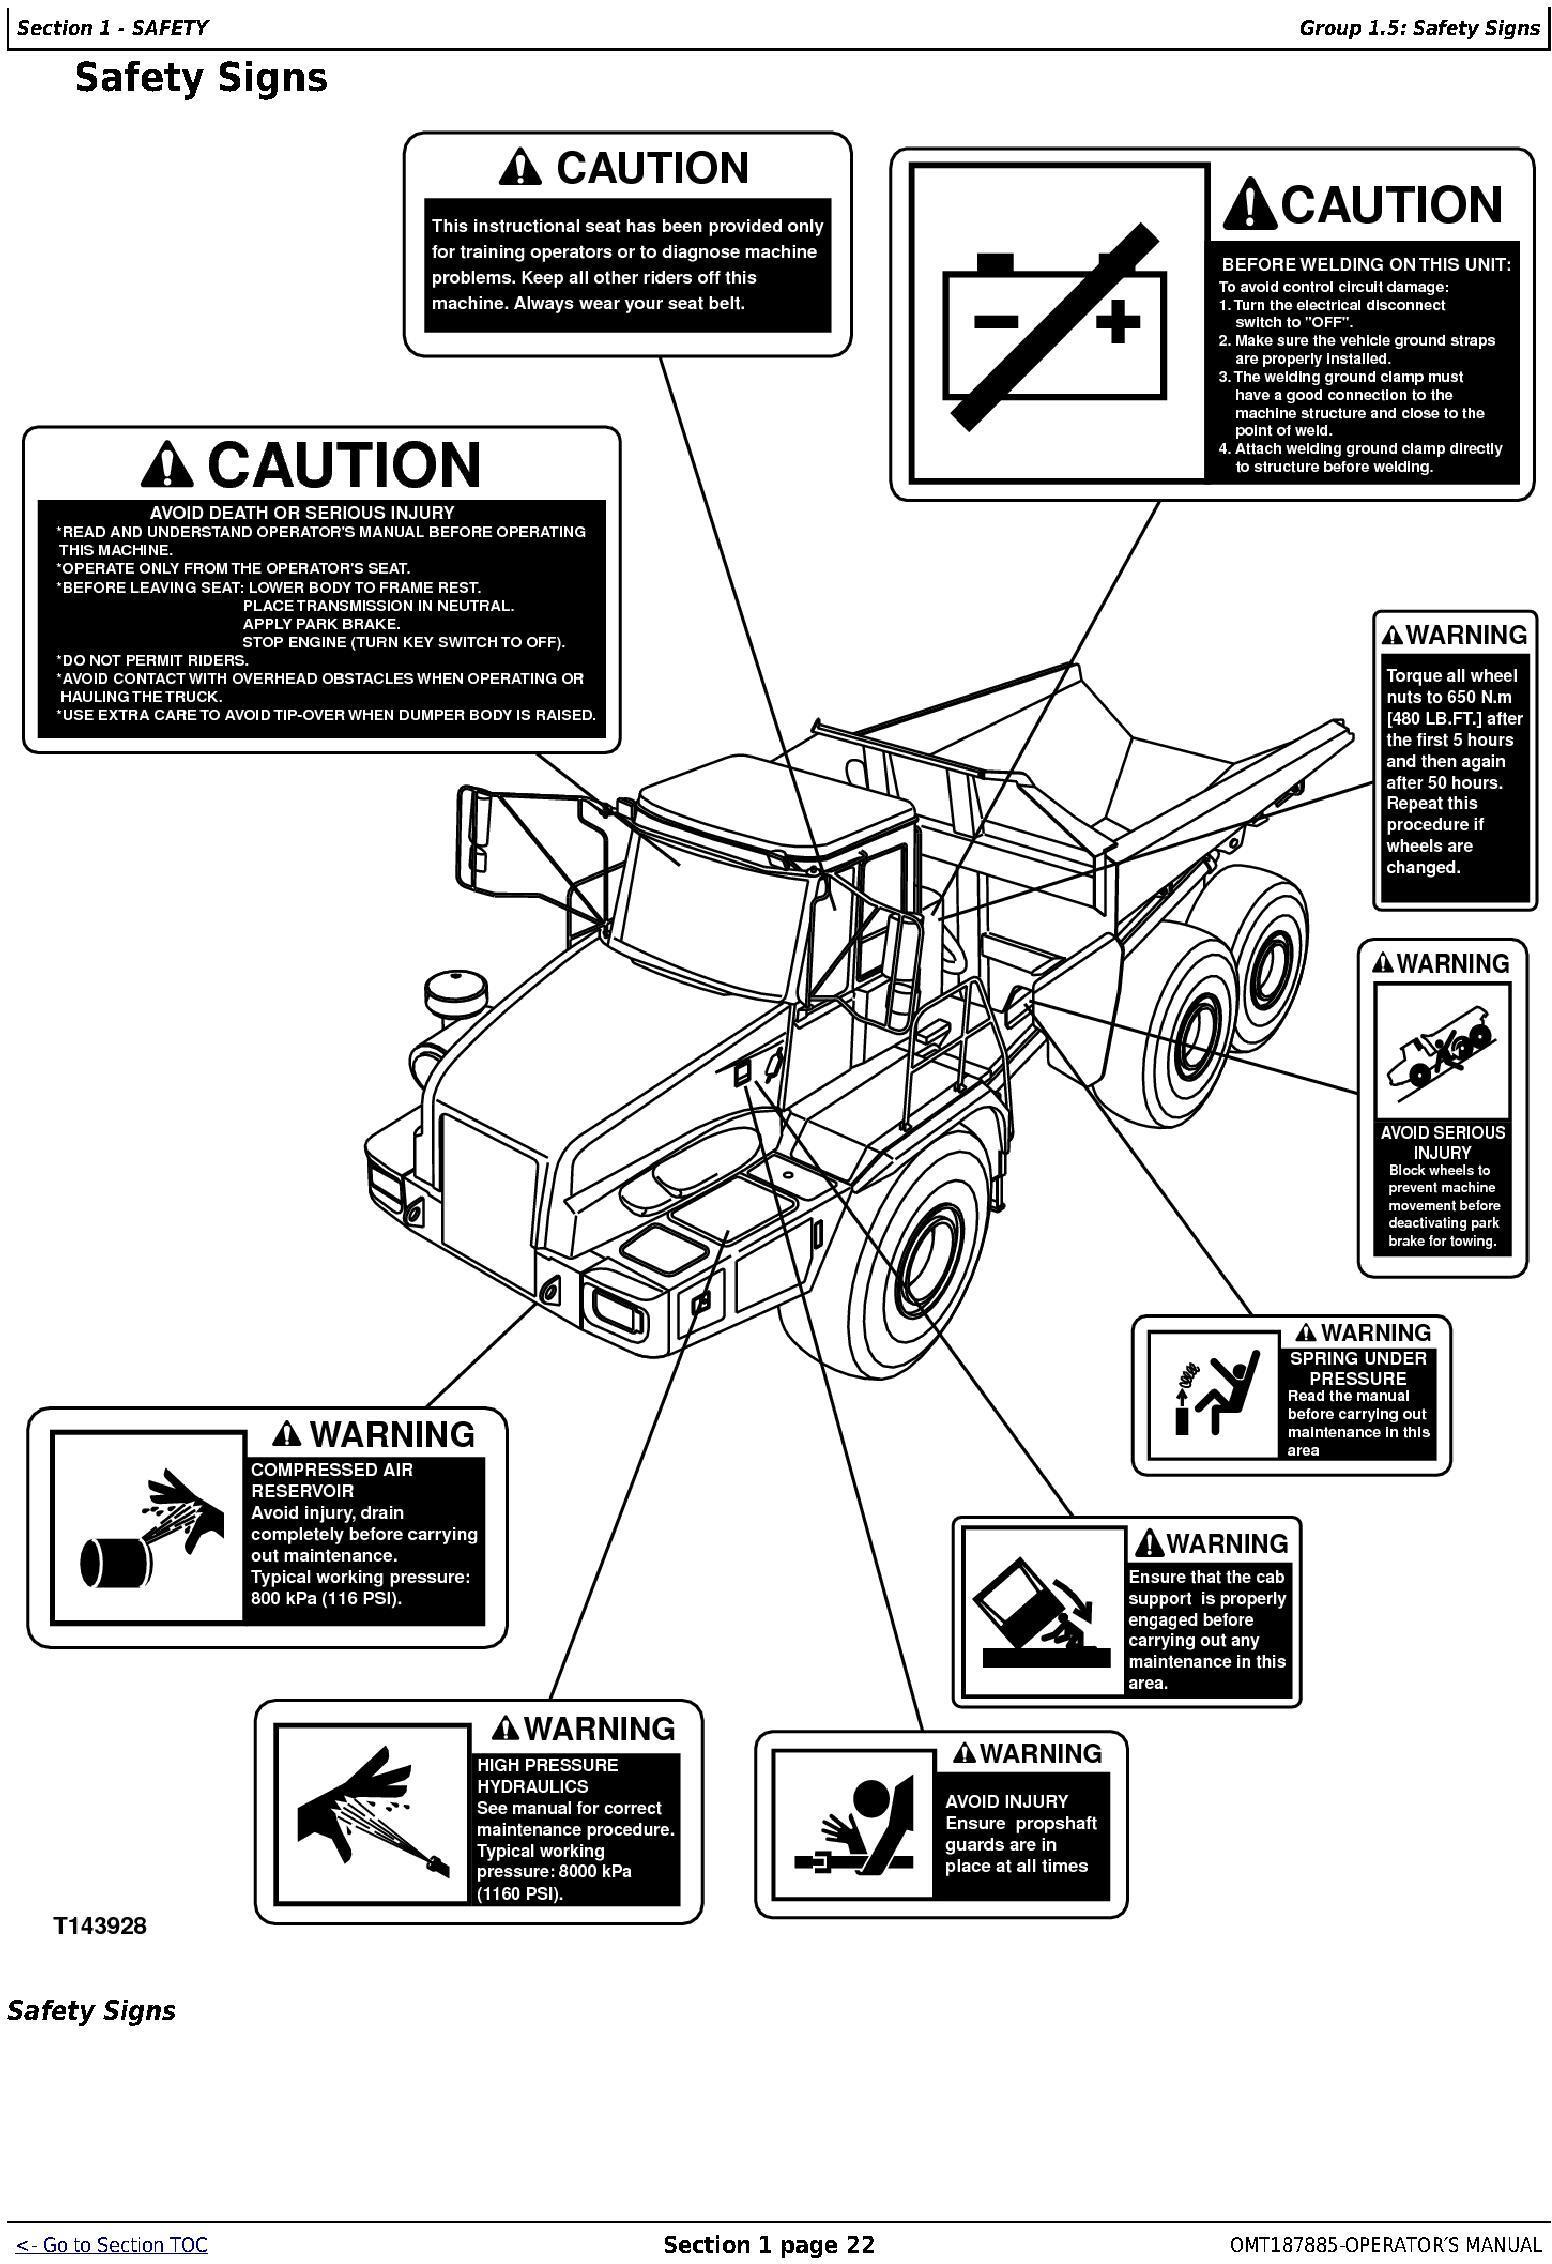 OMT187885 - John Deere 350D and 400D Articulated Dump Truck (S.N. -608489) Operator`s Manual - 1